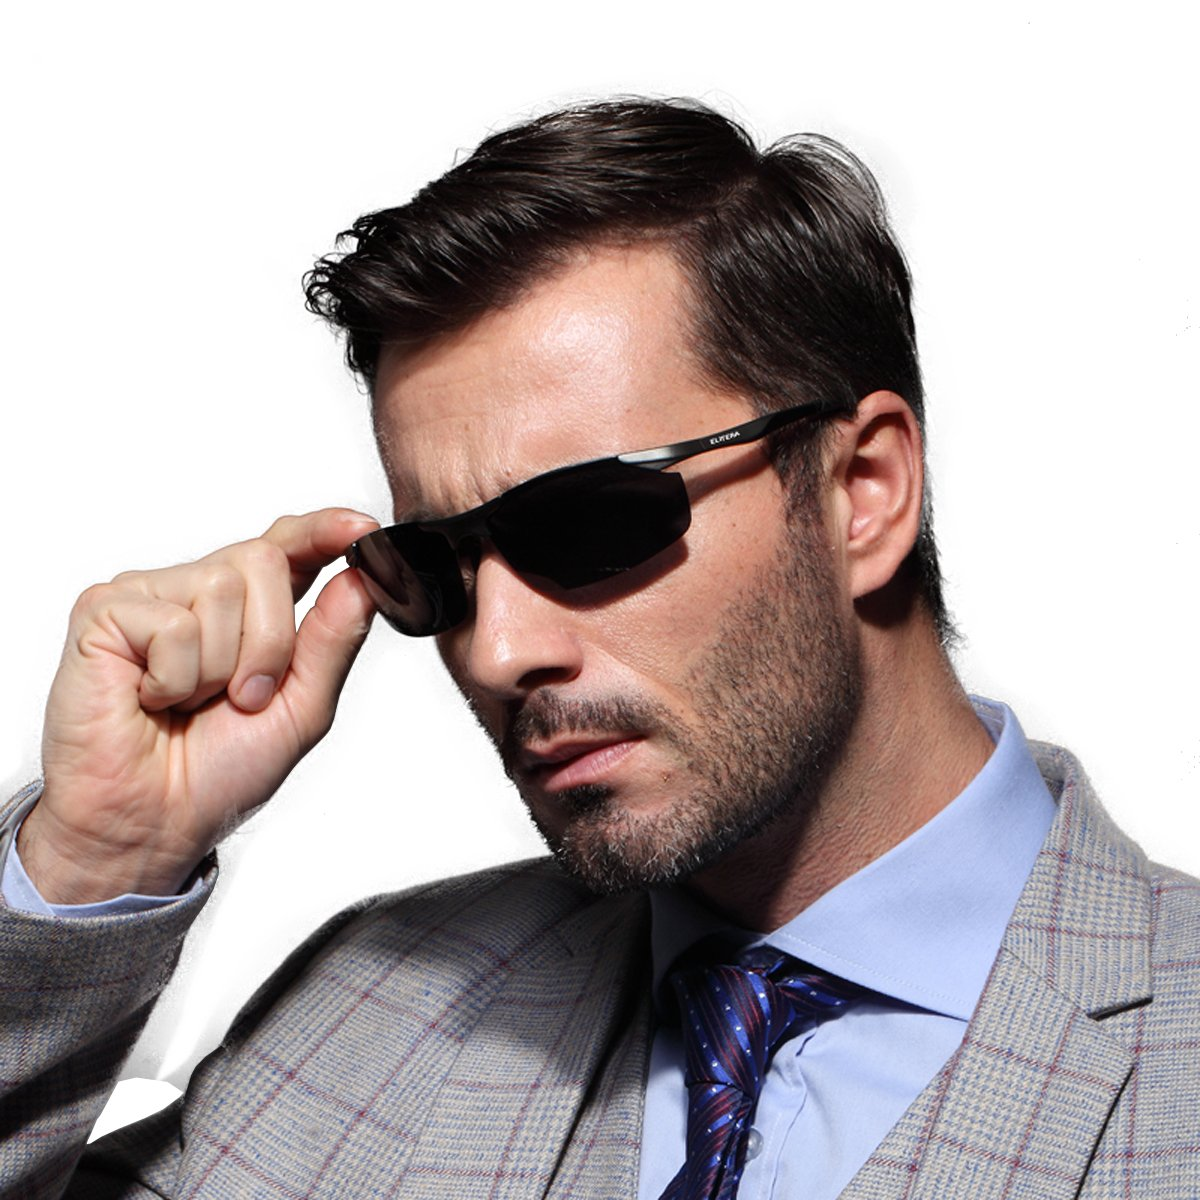 ELITERA Aluminum Magnesium Alloy Polarized Sunglasses Mens For Sports Driving Traval E8179 (GRAY&GRAY, 70)